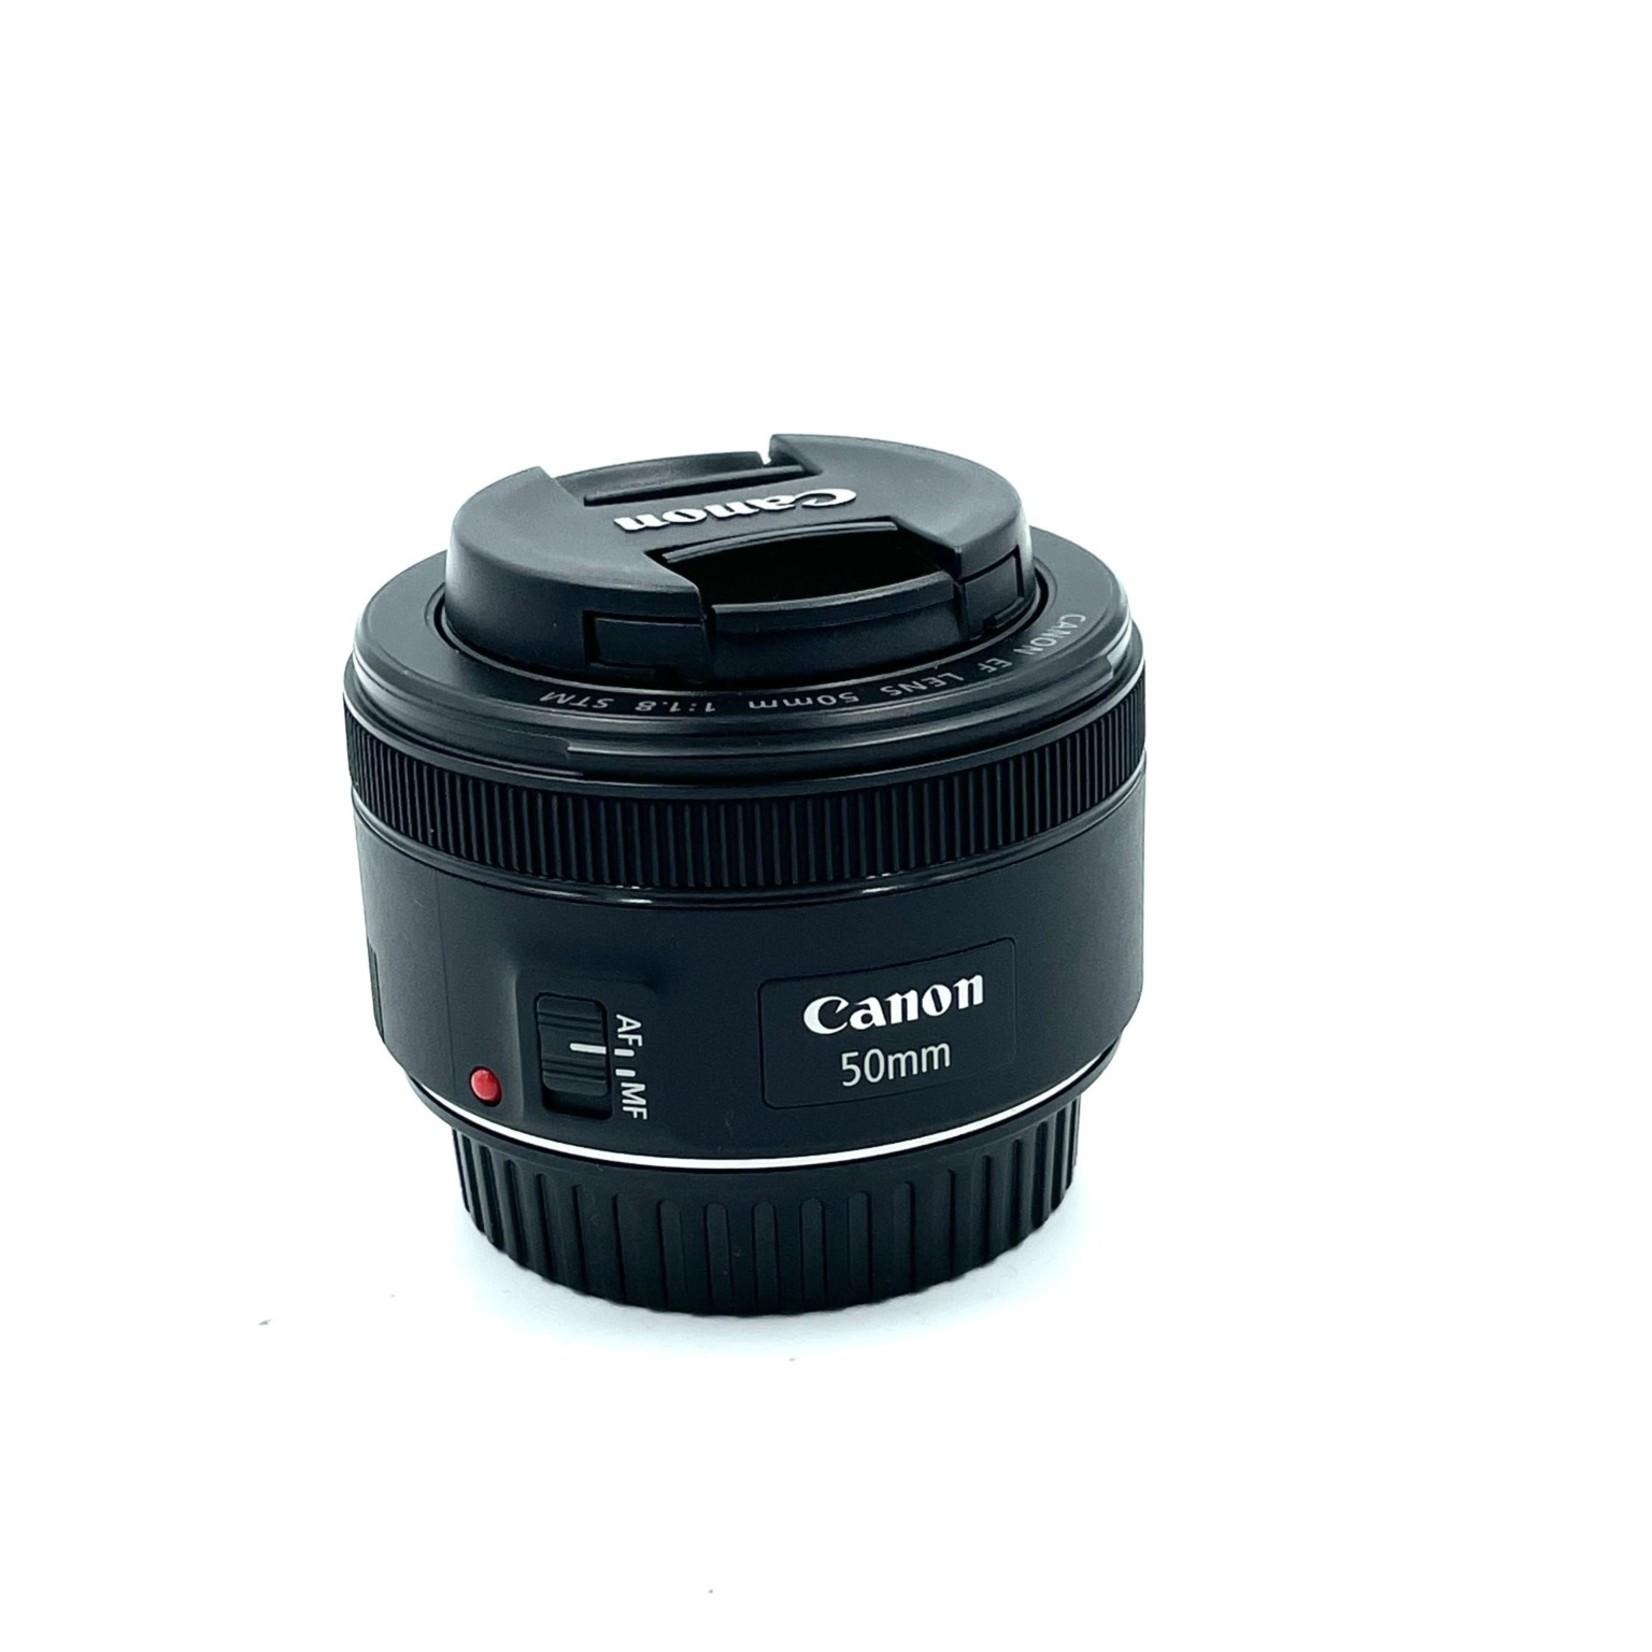 Canon Used Canon 50mm F1.8